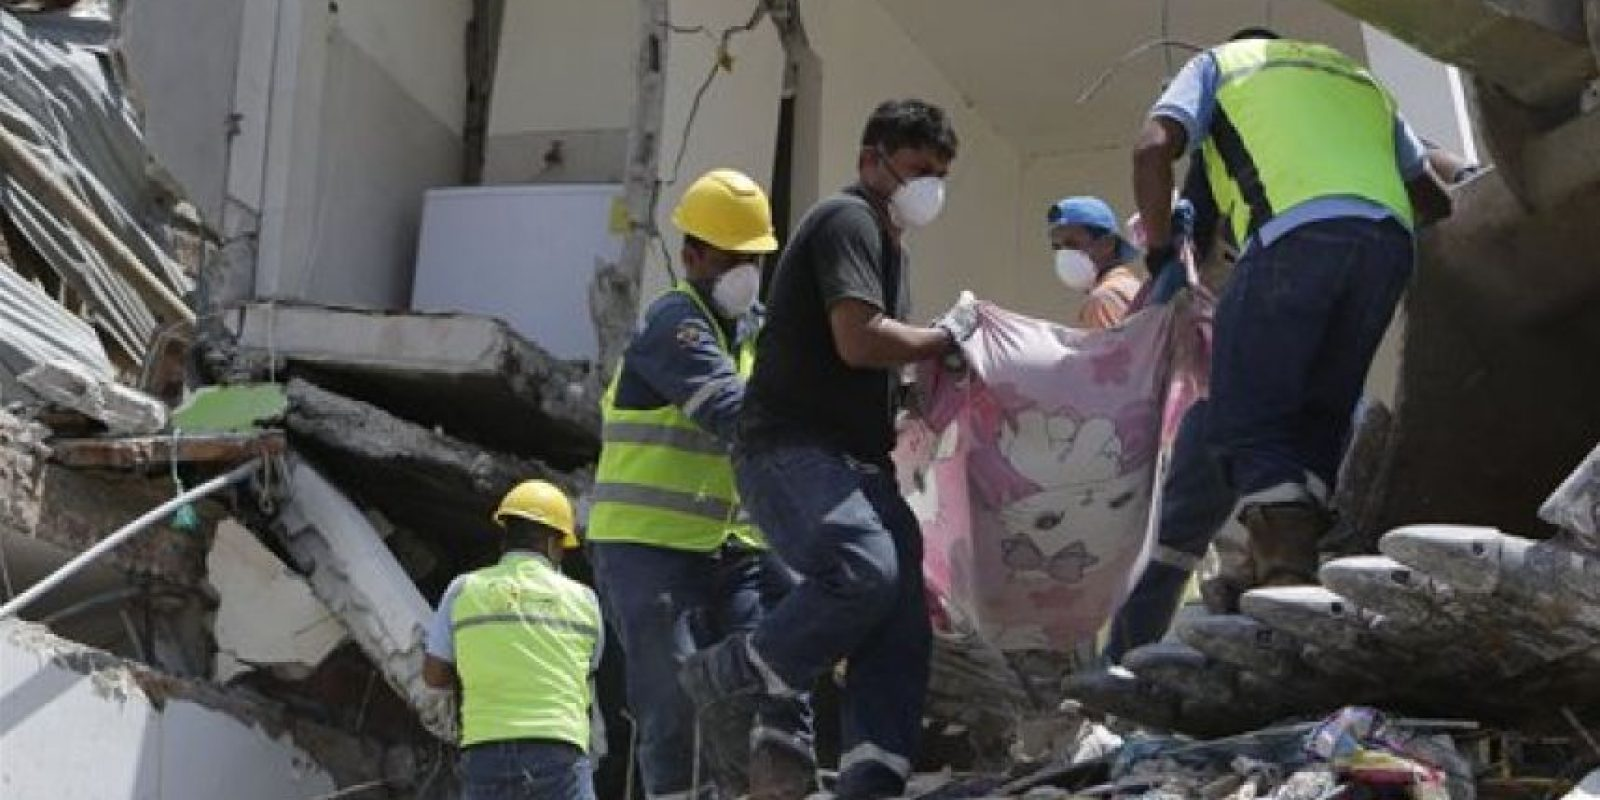 Las autoridades continúan buscando víctimas. Foto:AP